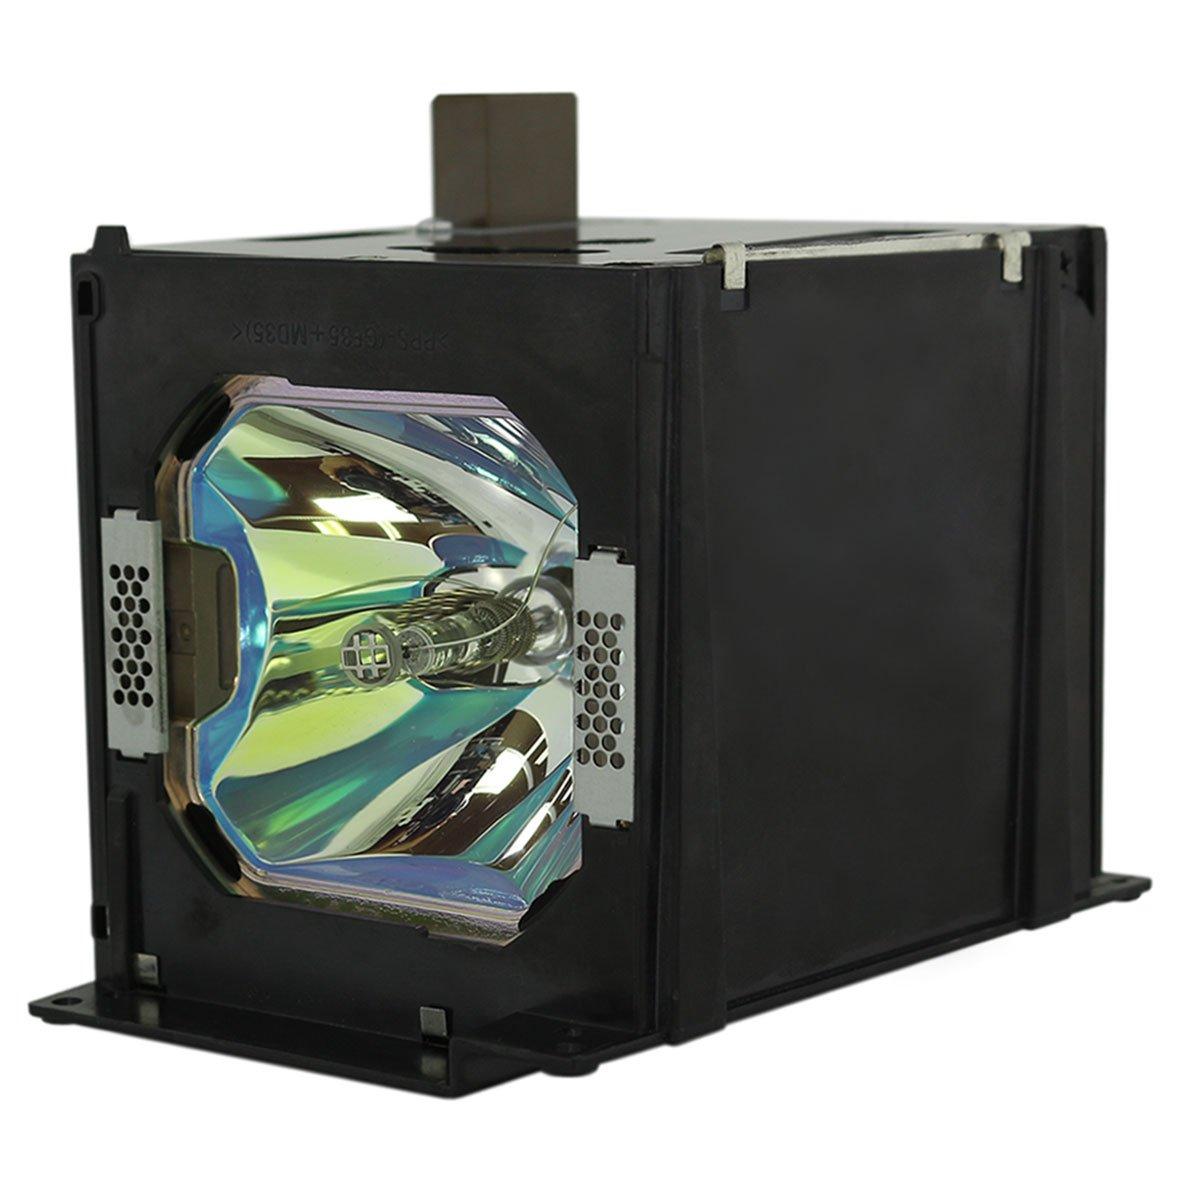 AuraBeam経済の交換用プロジェクターランプRUNCO vx-4000 C with housing   B01BG0M370